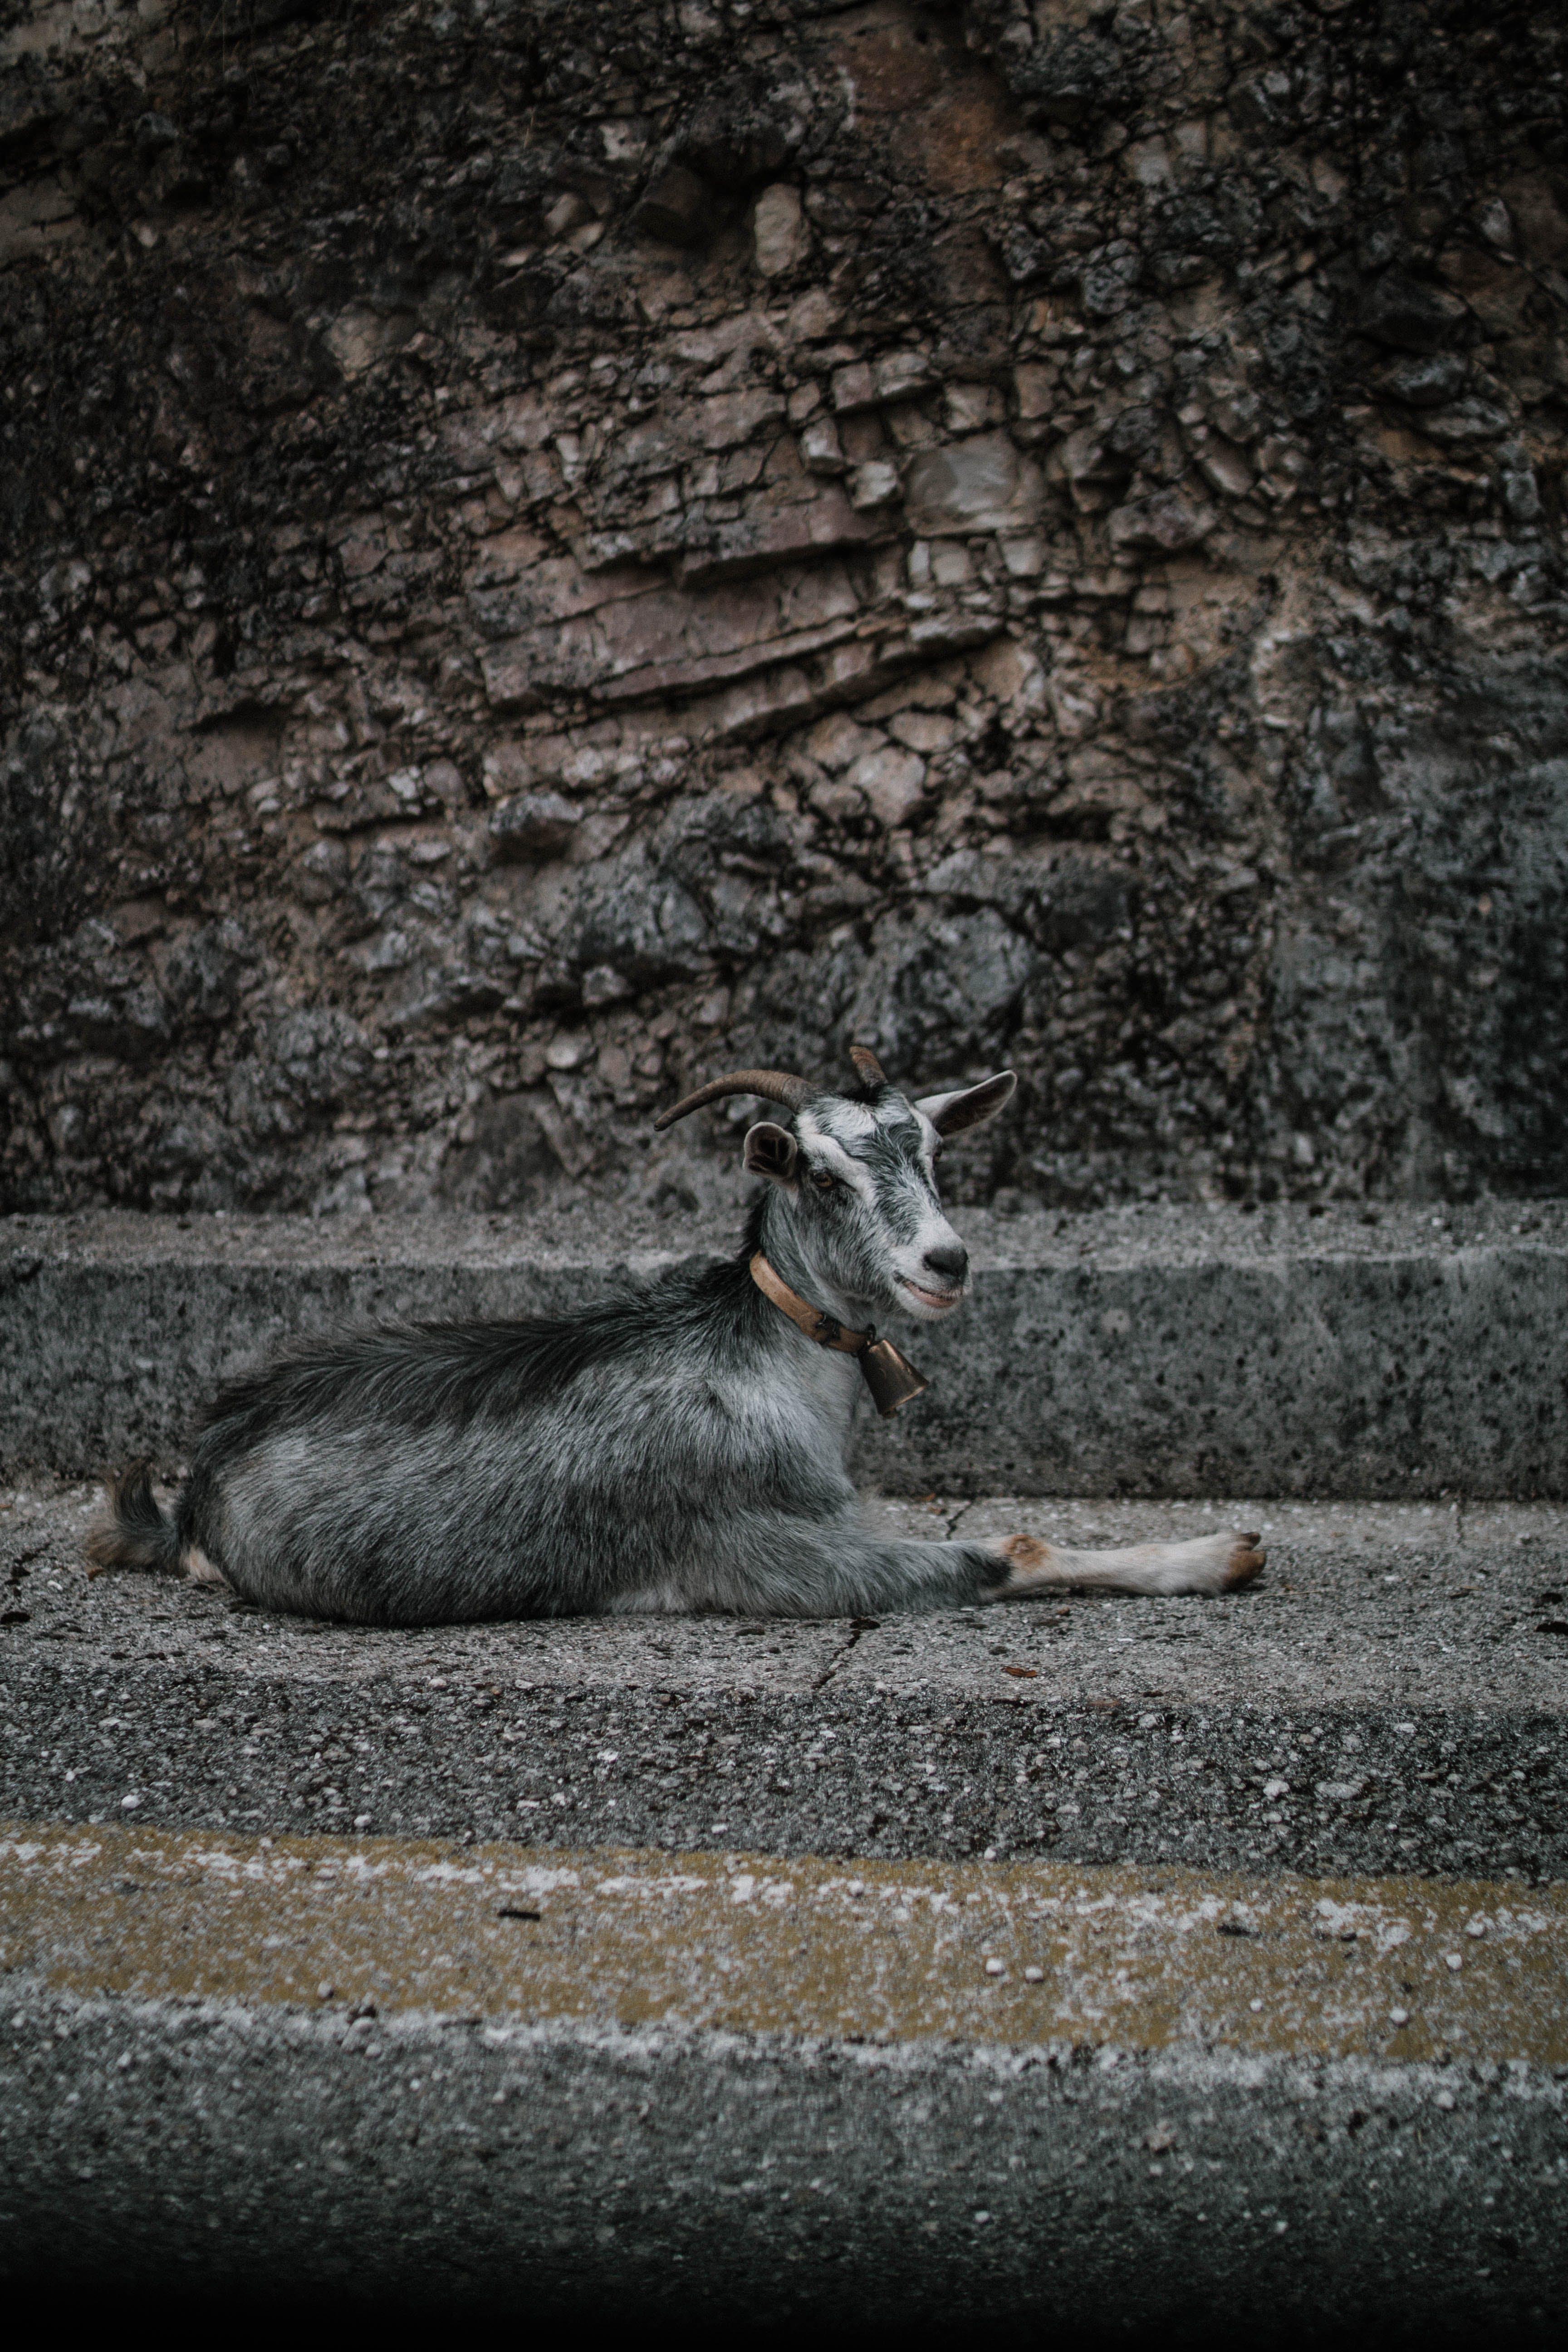 Goat Resting On Concrete Floor